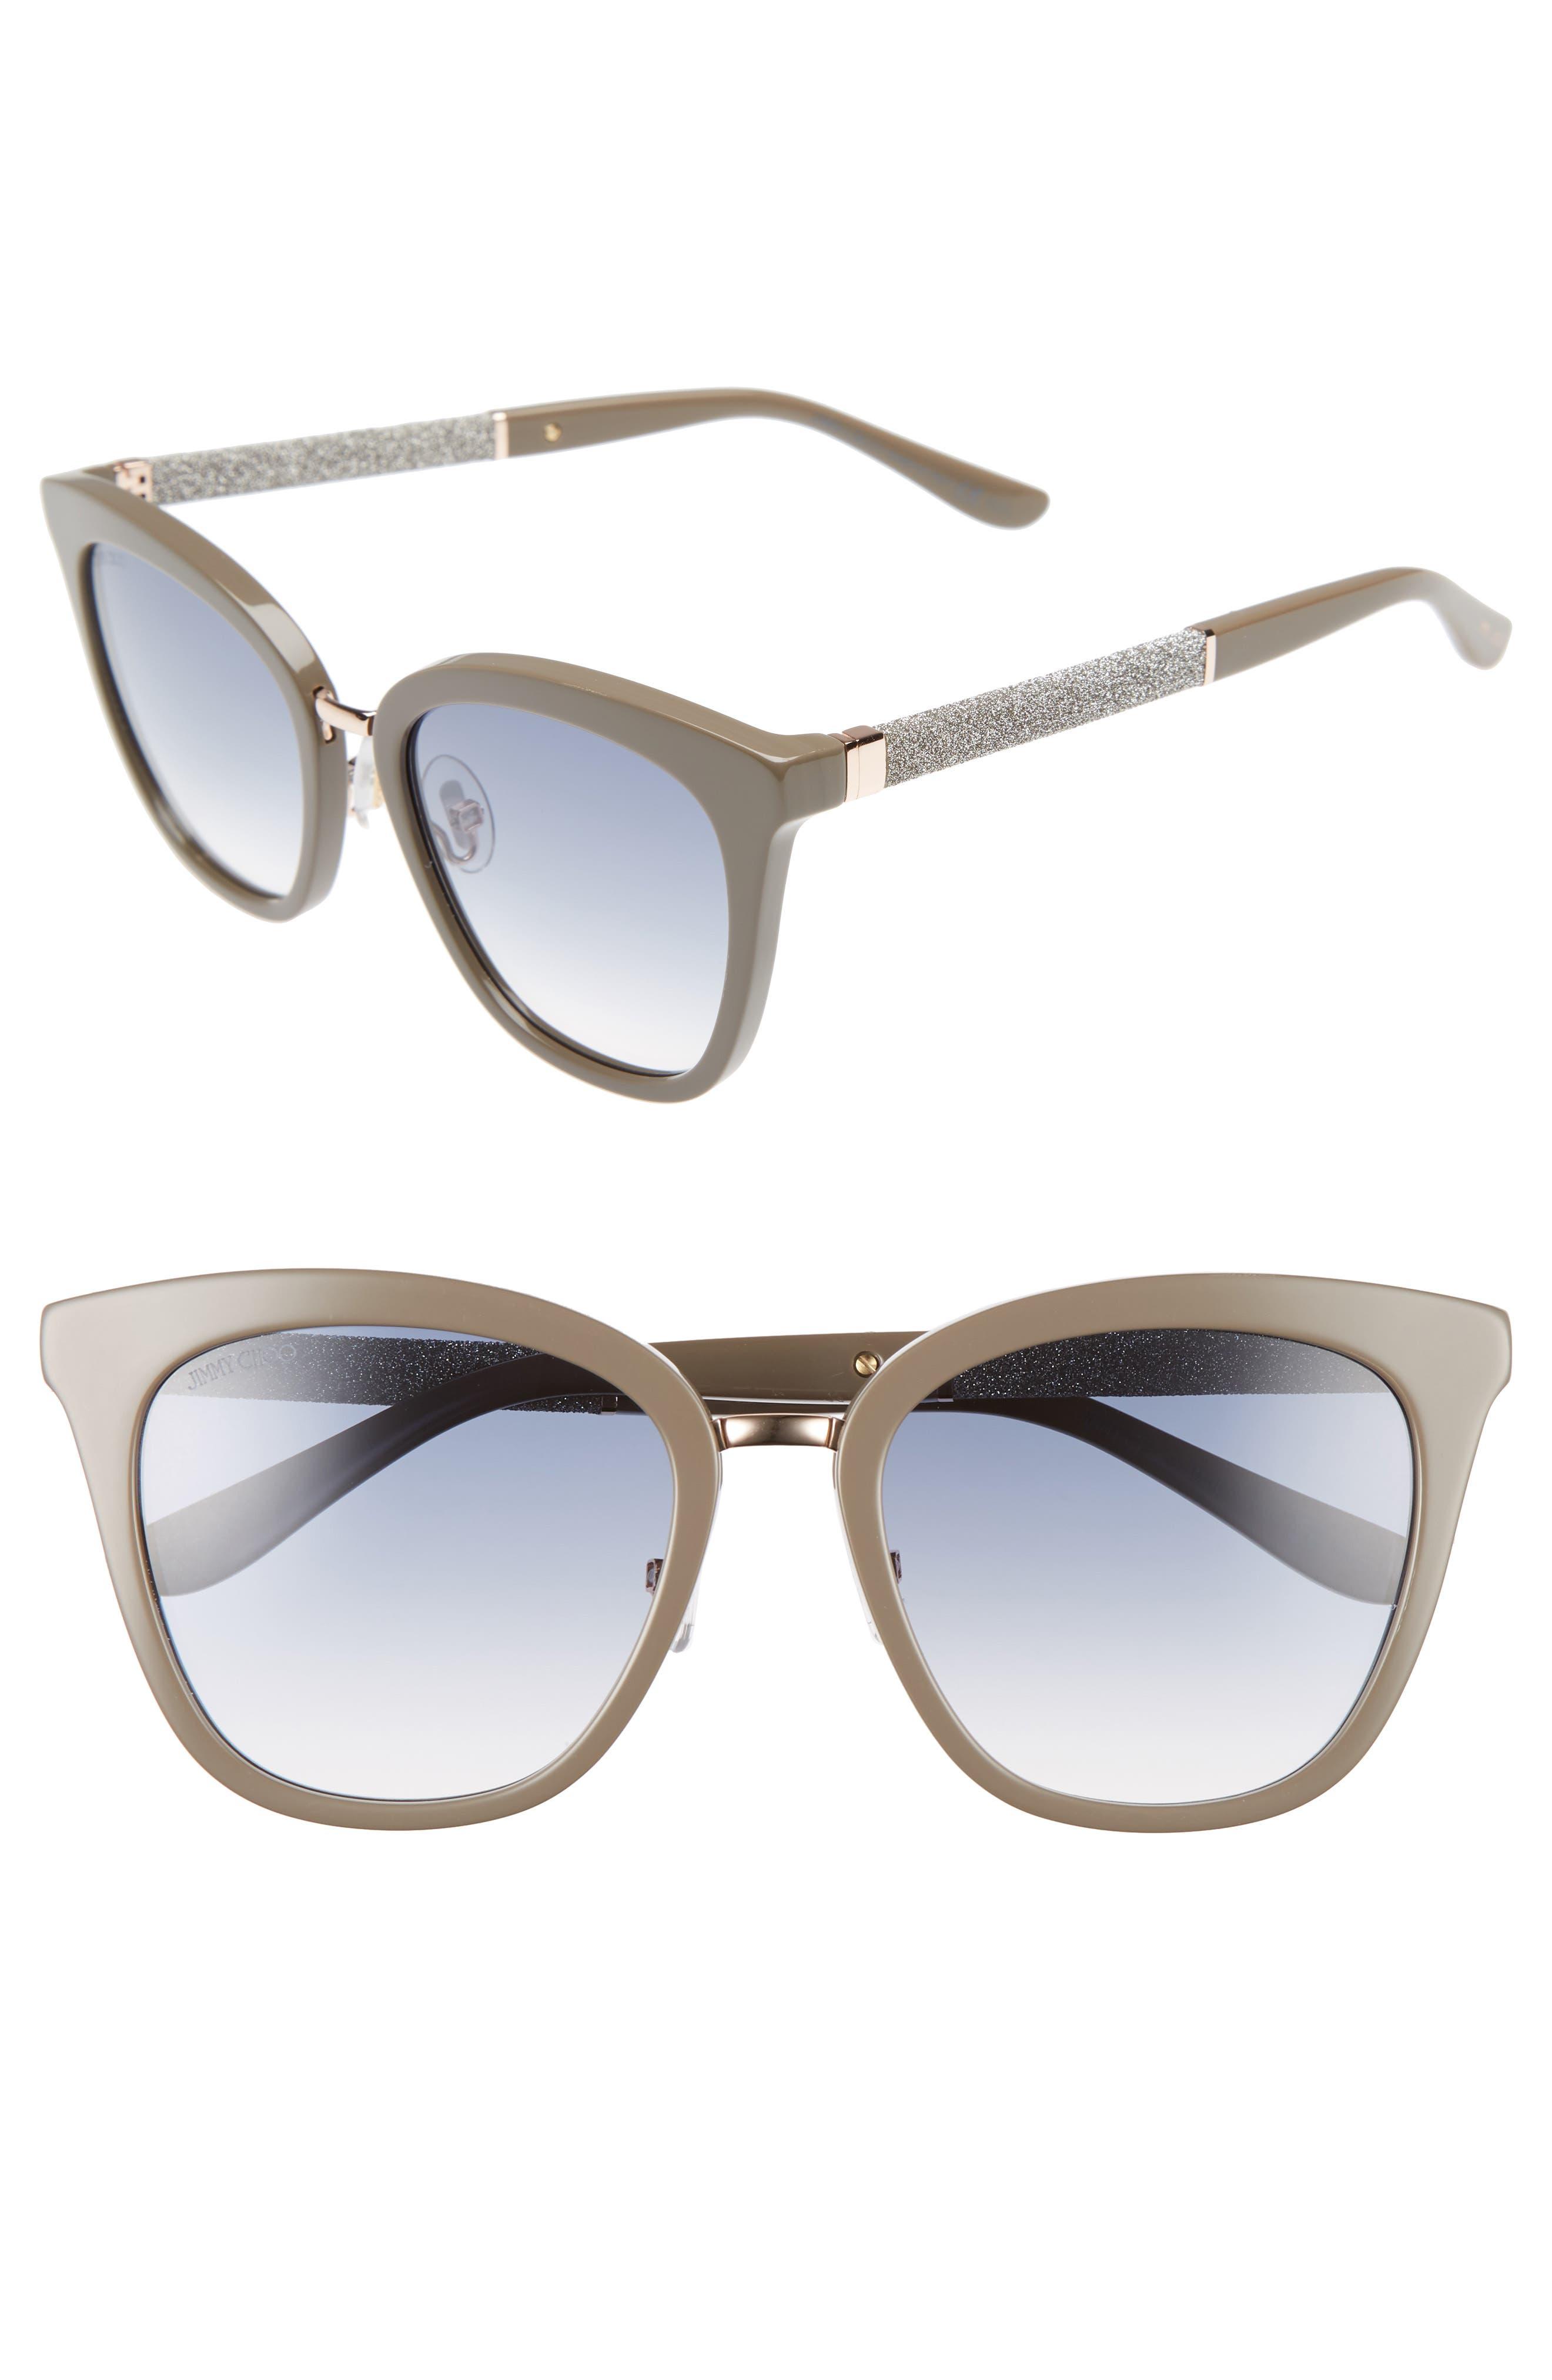 Main Image - Jimmy Choo Fabry 53mm Sunglasses